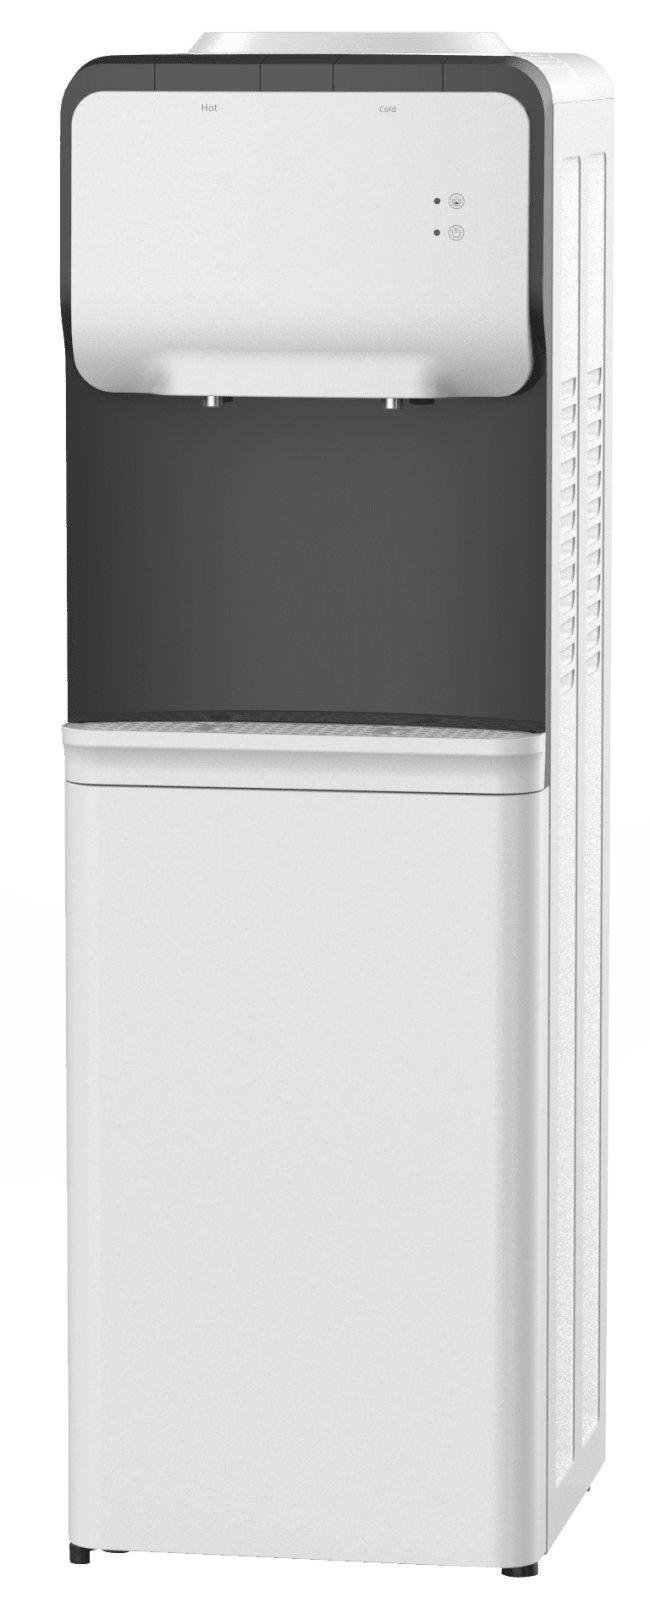 Автомат за вода Crown CWD-1925 Pure